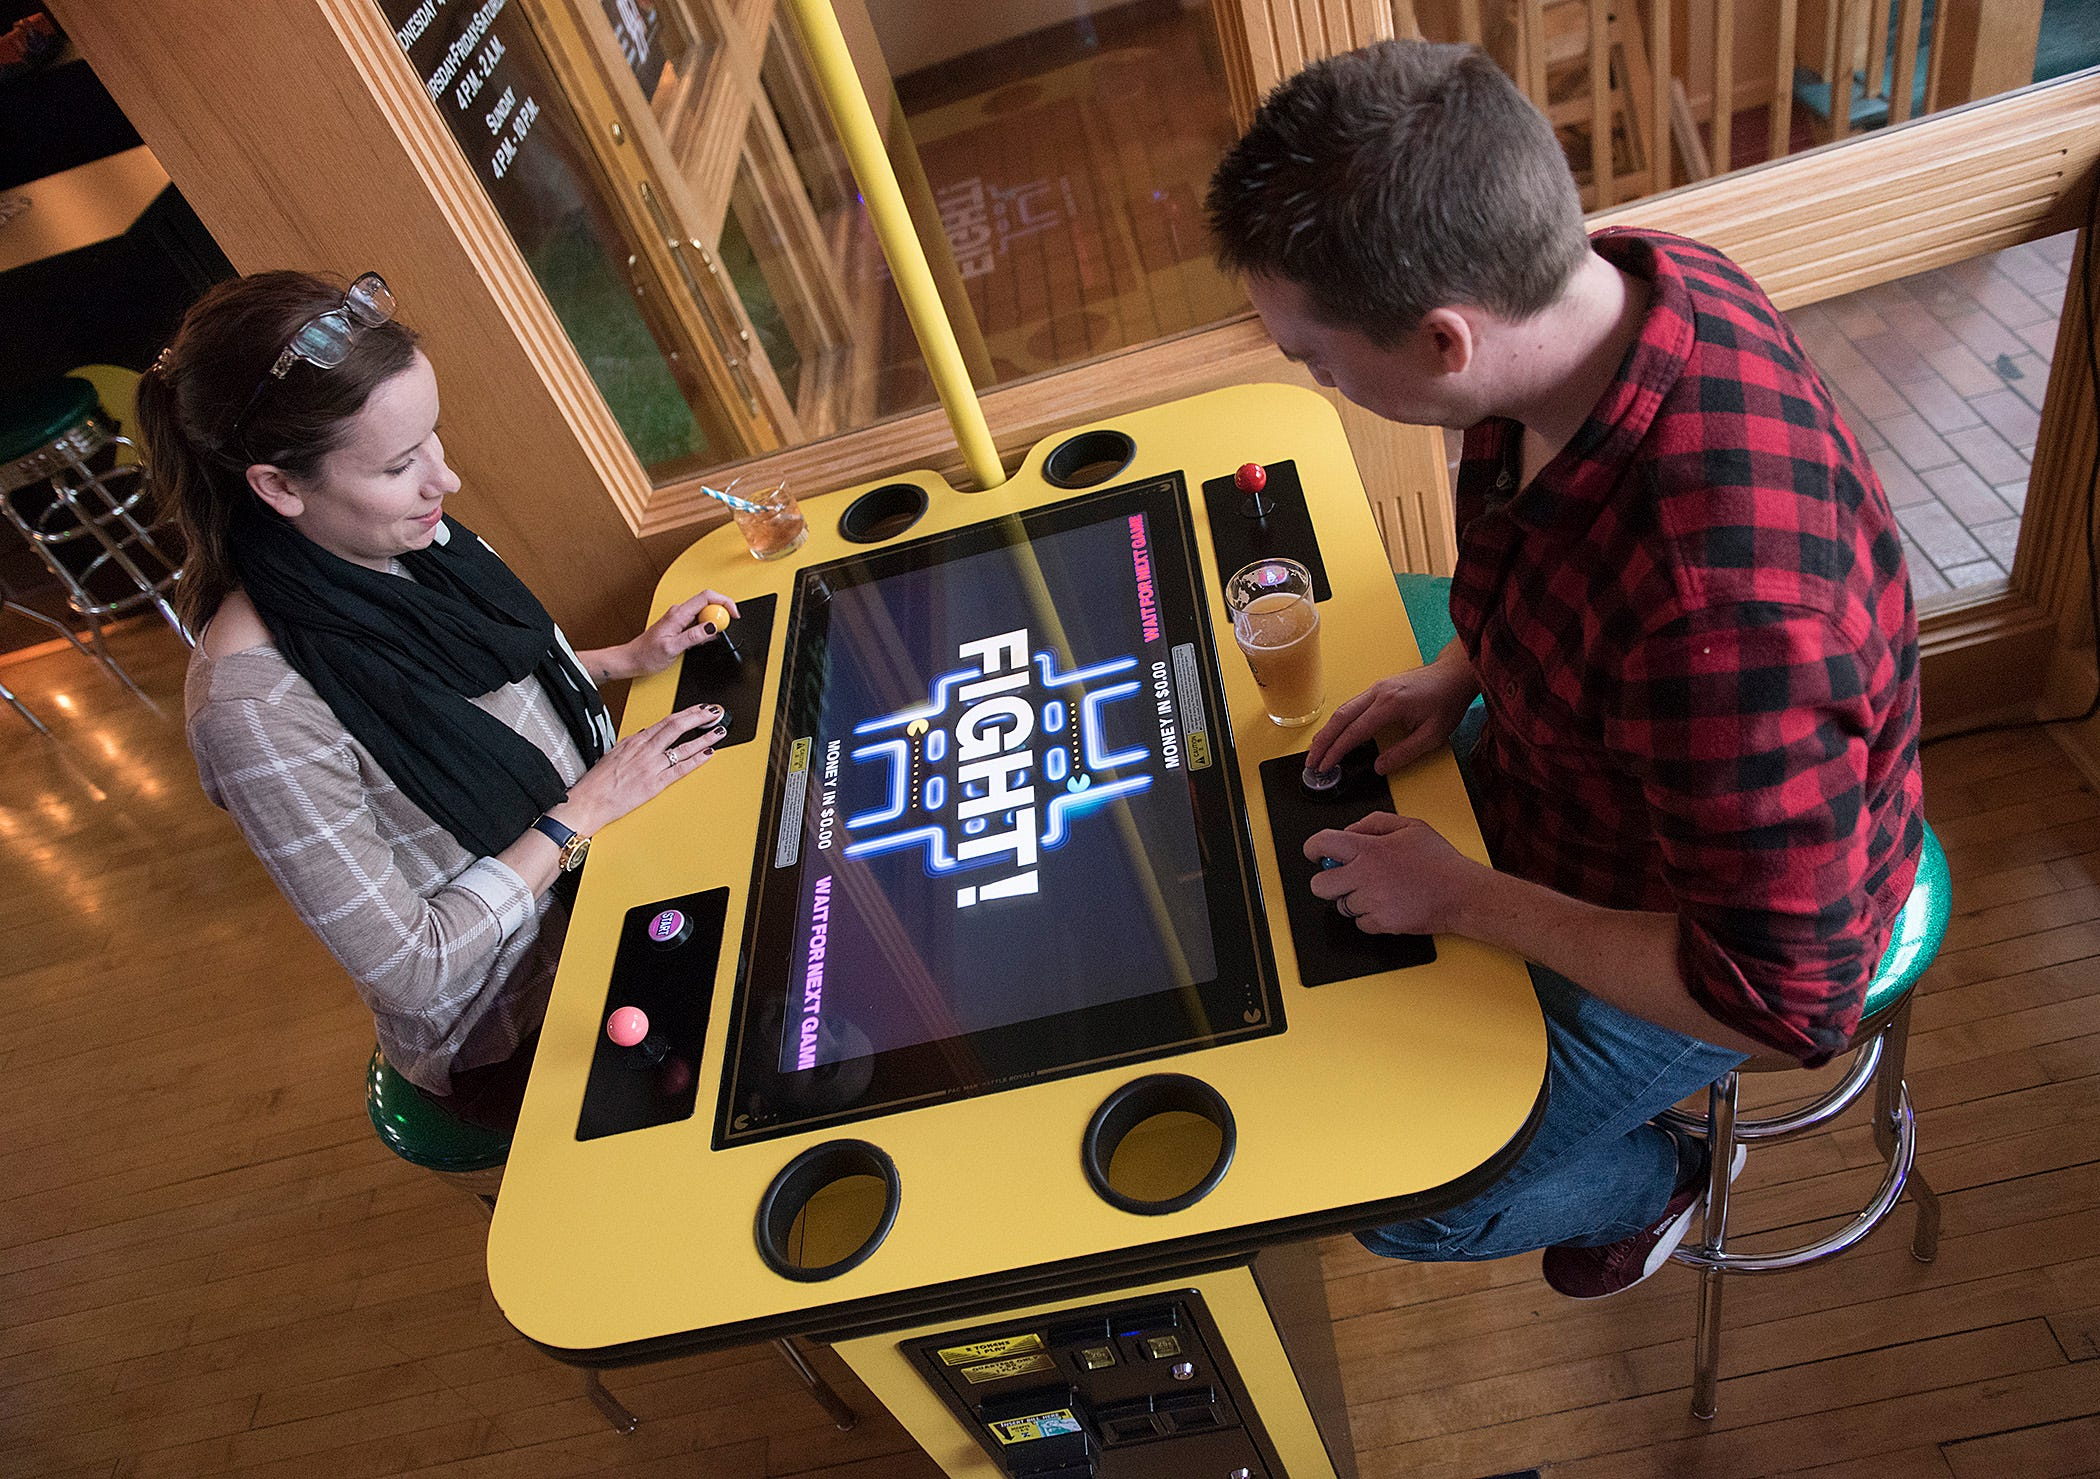 Basement Burger Bar owners open 1 Up Arcade Bar in Farmington